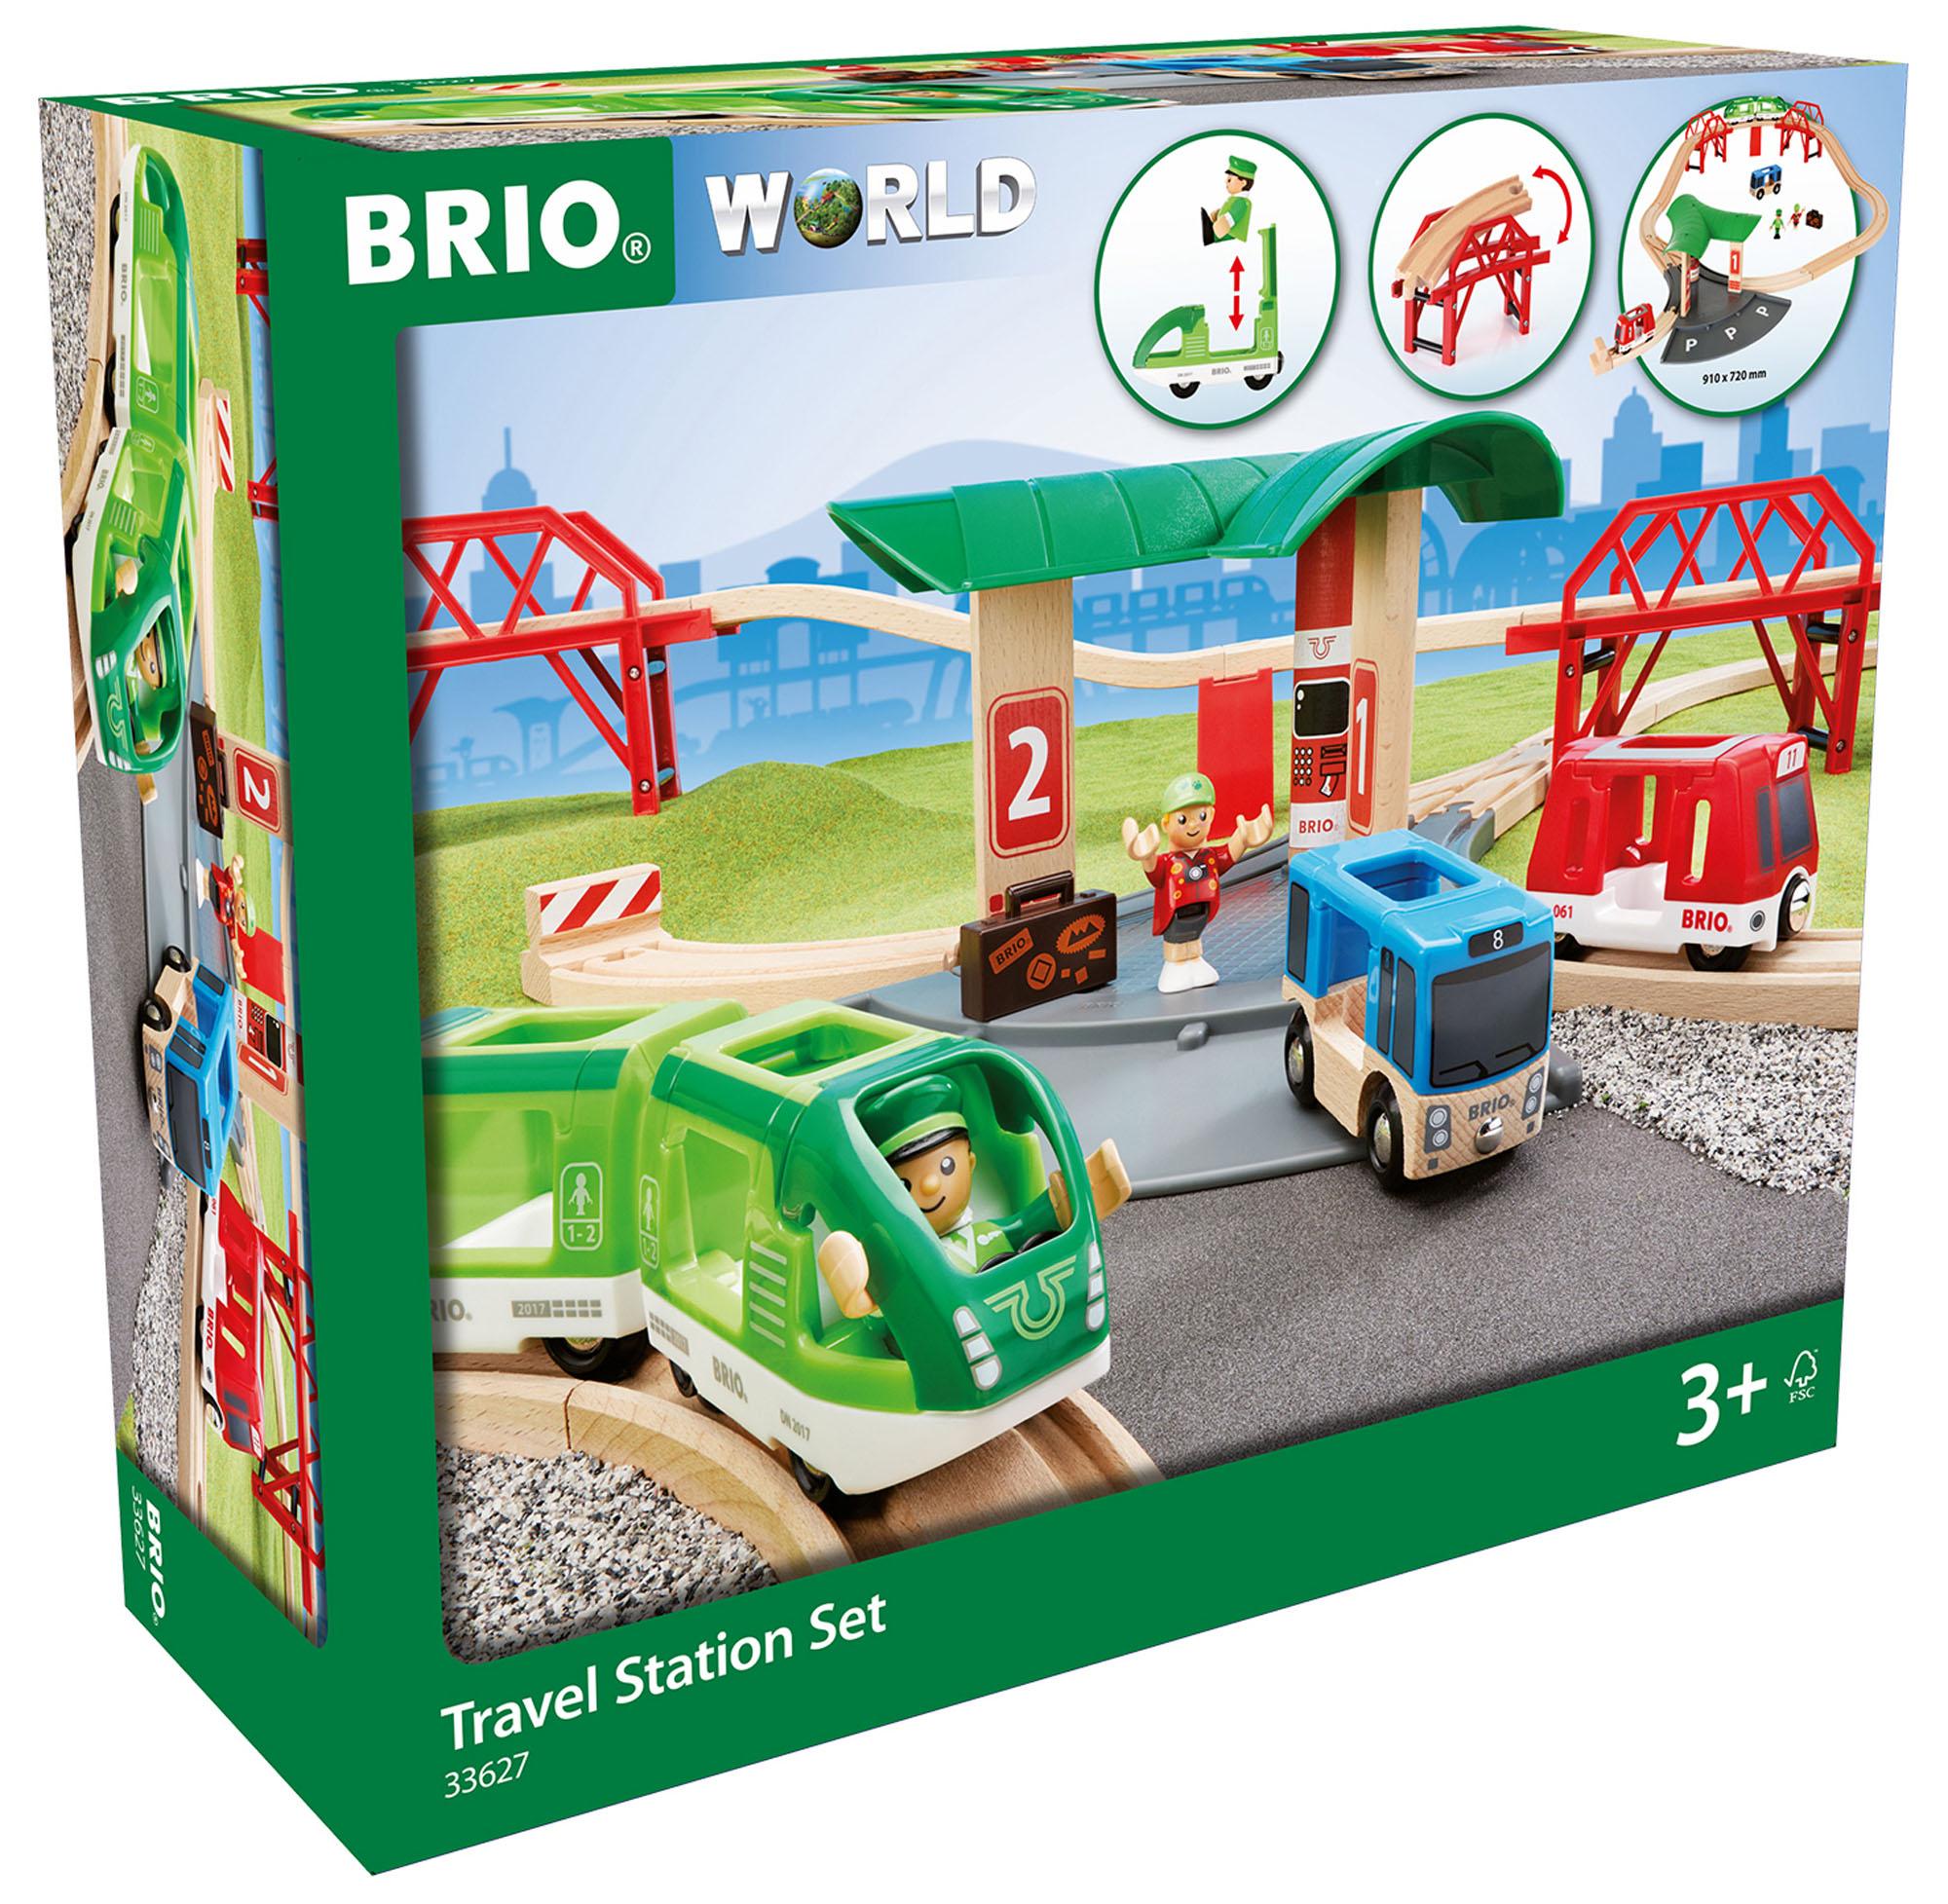 33627 BRIO Travel Station Set